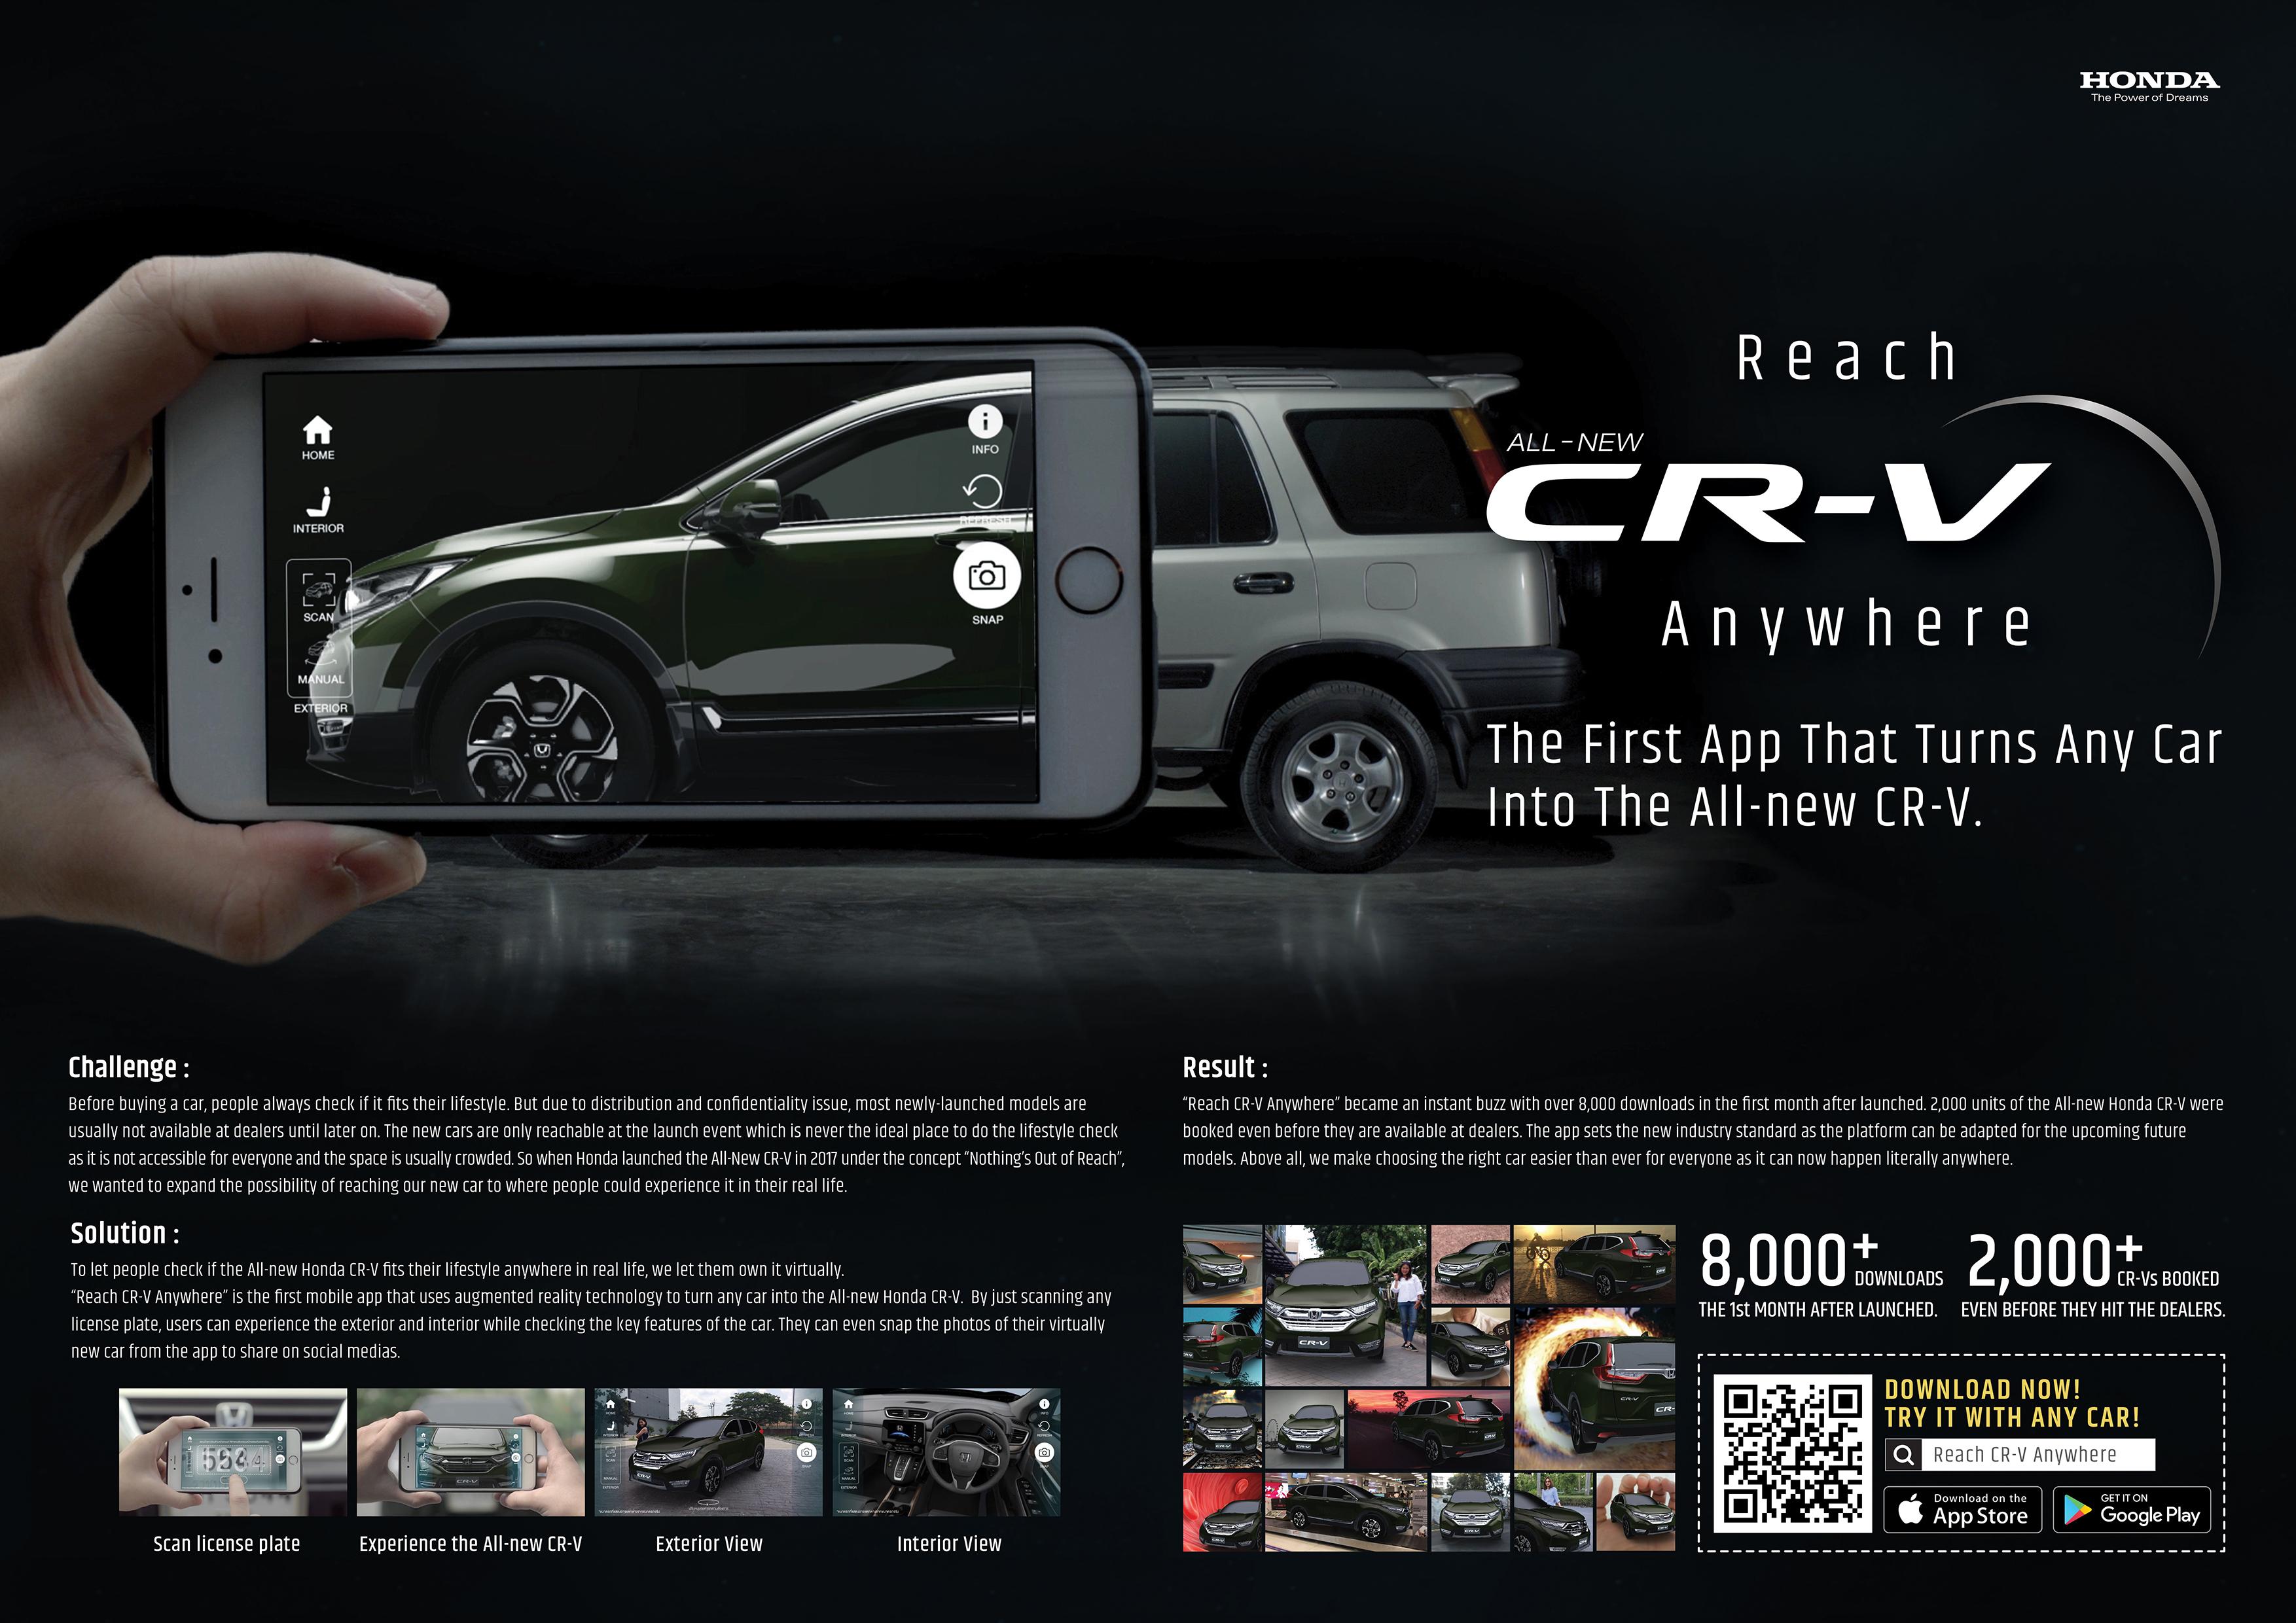 Honda Digital Advert By Rabbit s Tale Reach CR V anywhere